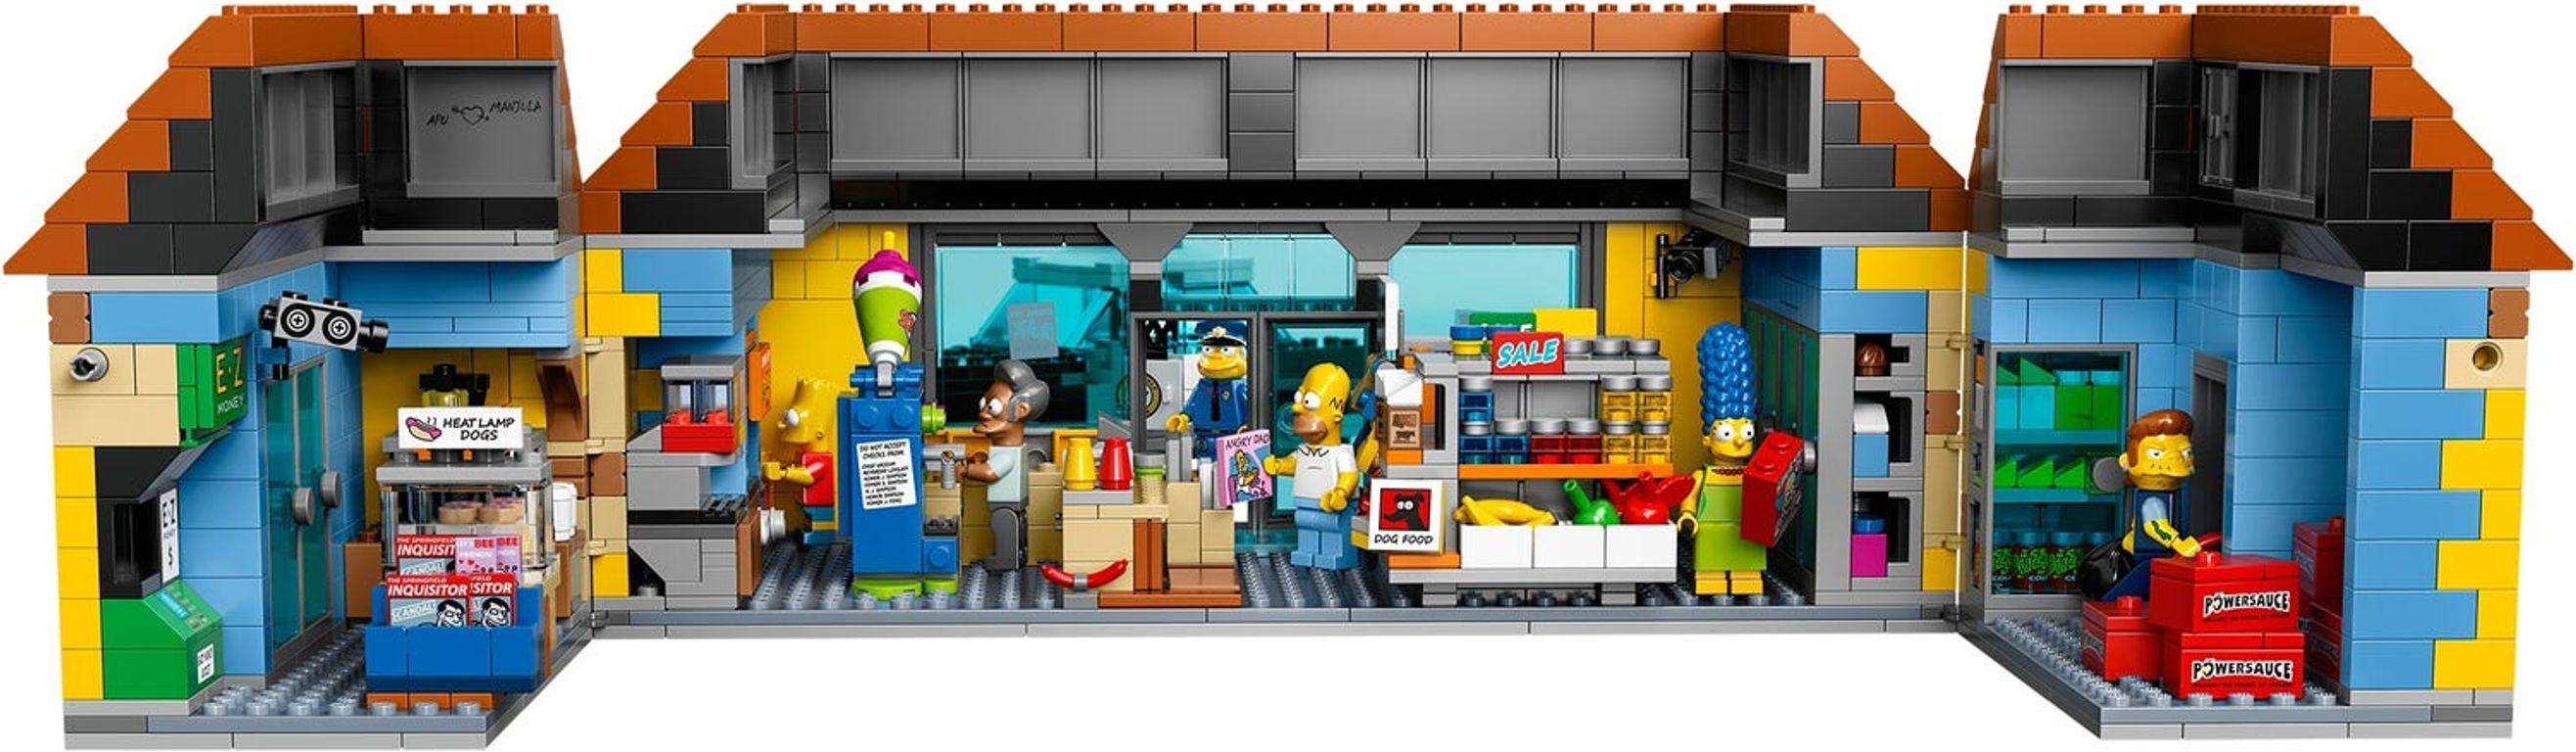 Kwik-E-Mart interior